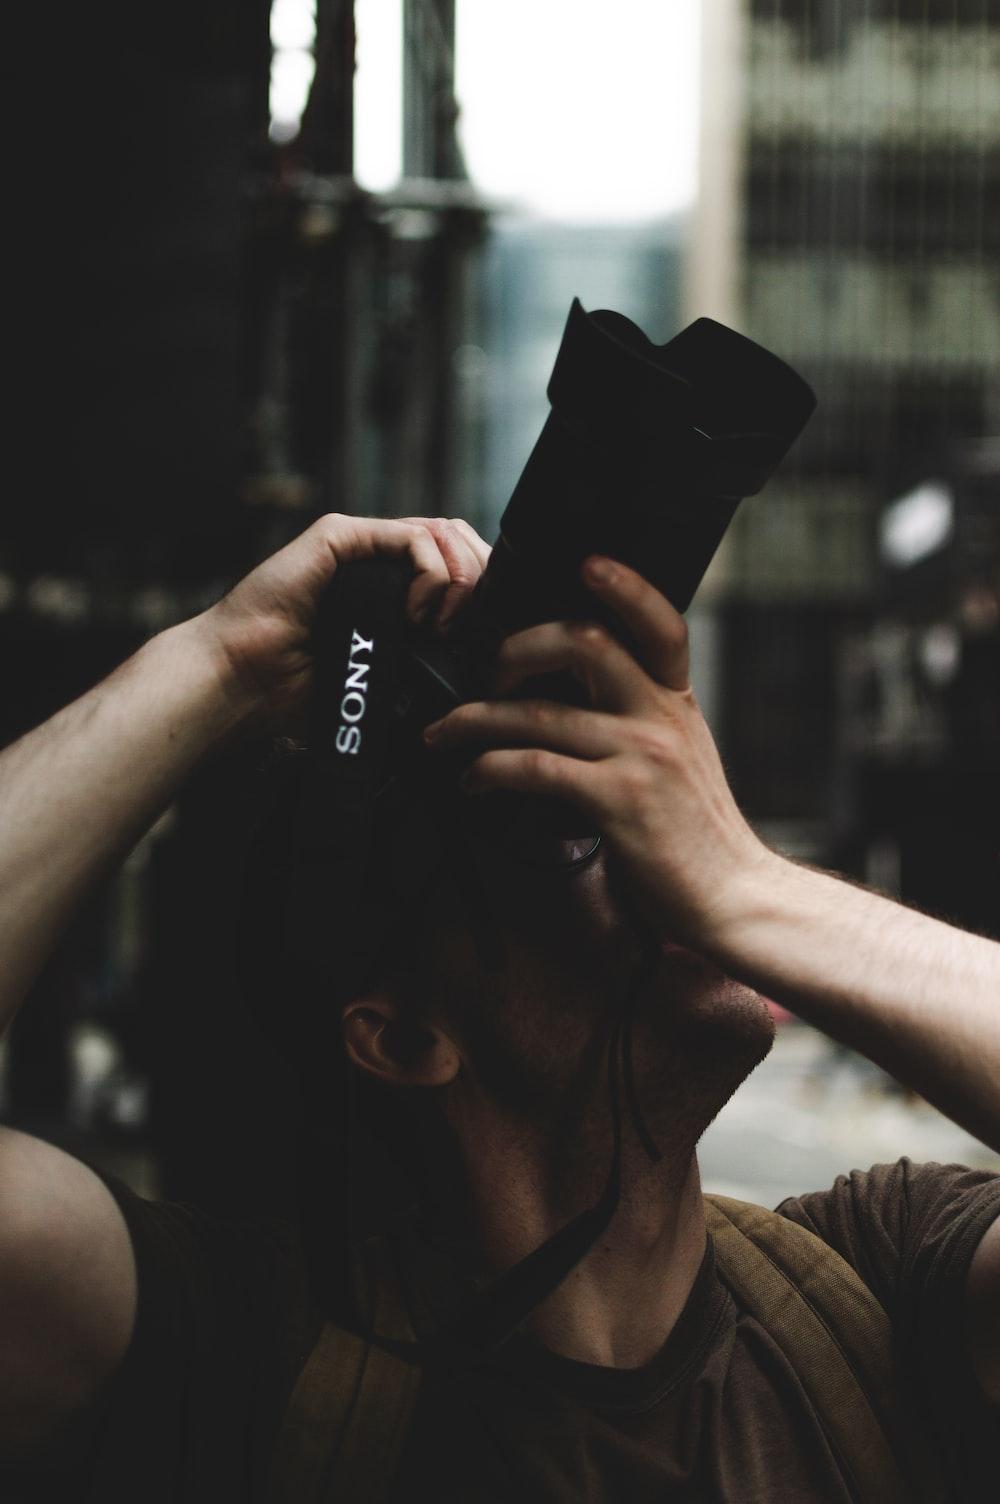 person using Sony DSLR camera